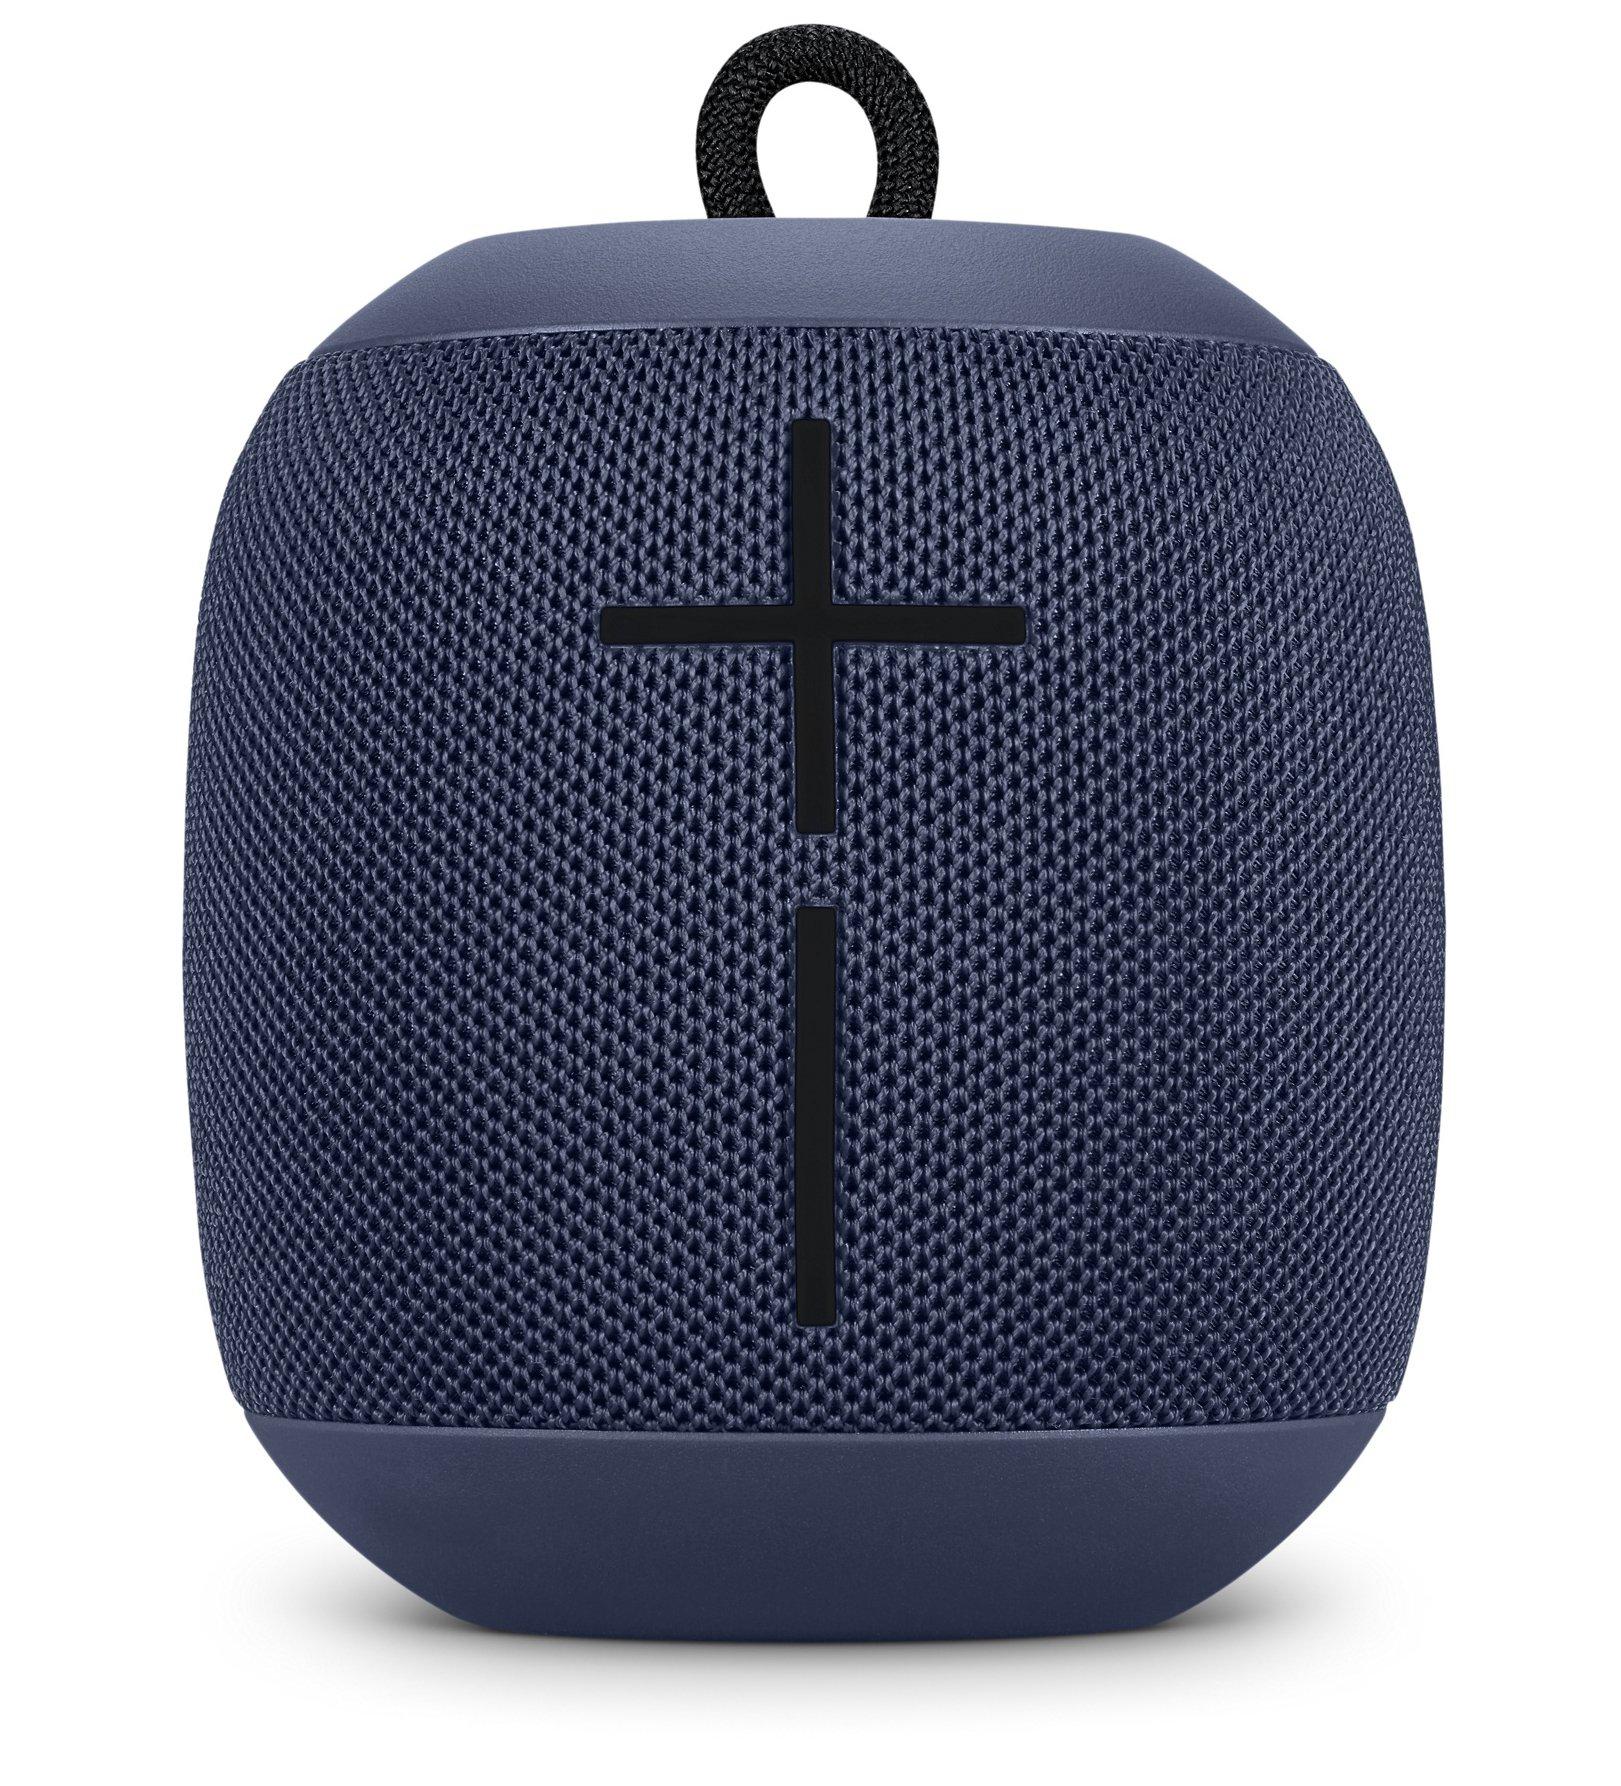 Ultimate Ears WONDERBOOM Waterproof Super Portable Bluetooth Speaker – IPX7 Waterproof – 10-hour Battery Life – Midnight Blue by Logitech (Image #1)